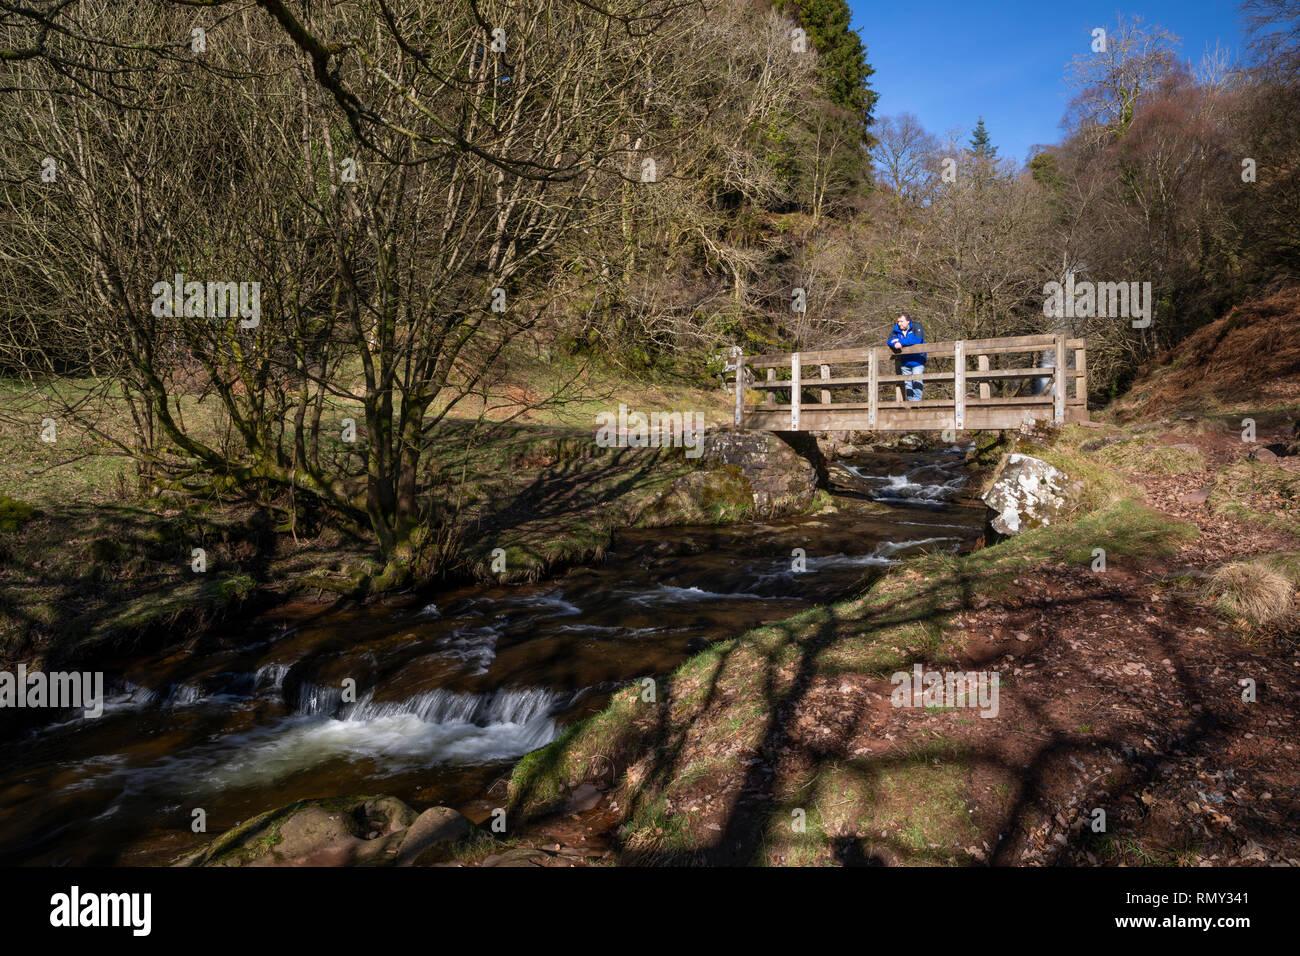 Blaen-y-Glyn waterfalls in The Brecon Beacons, Wales - Stock Image